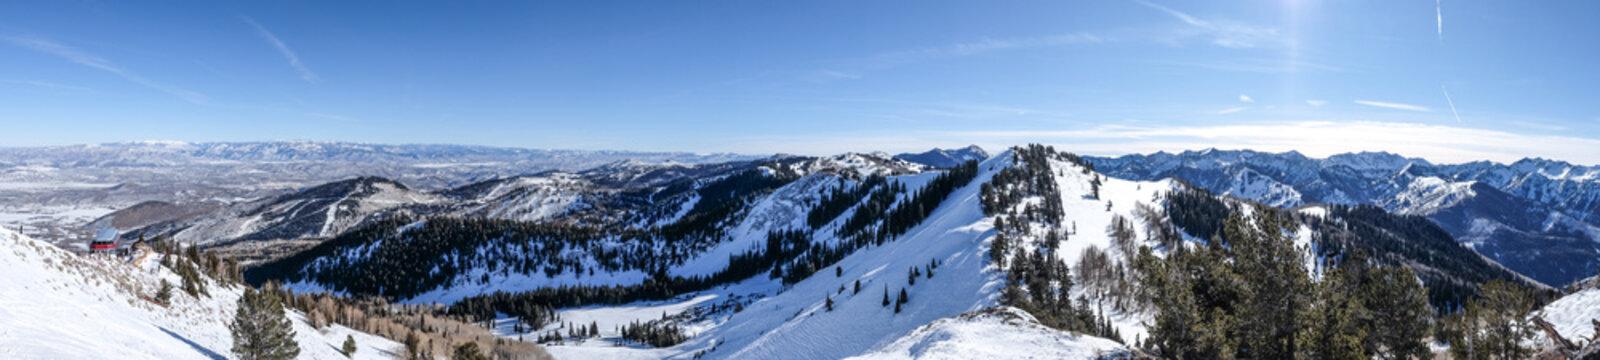 Ski/snowboard Backcountry - deserted area - snow capped - park city, utah